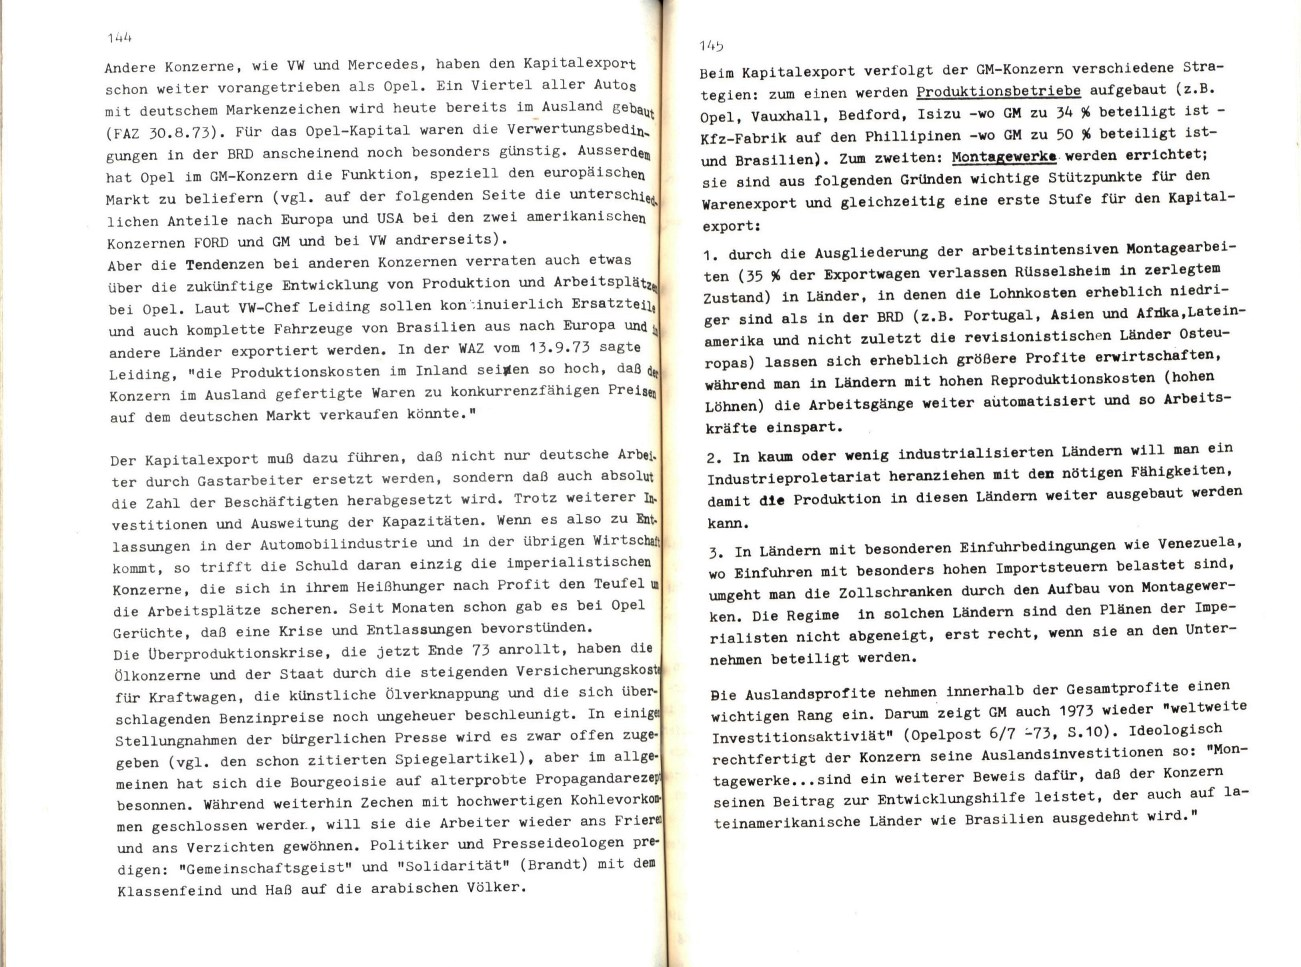 Bochum_IGM_Opel_PG_Opel_streikt_1973_075